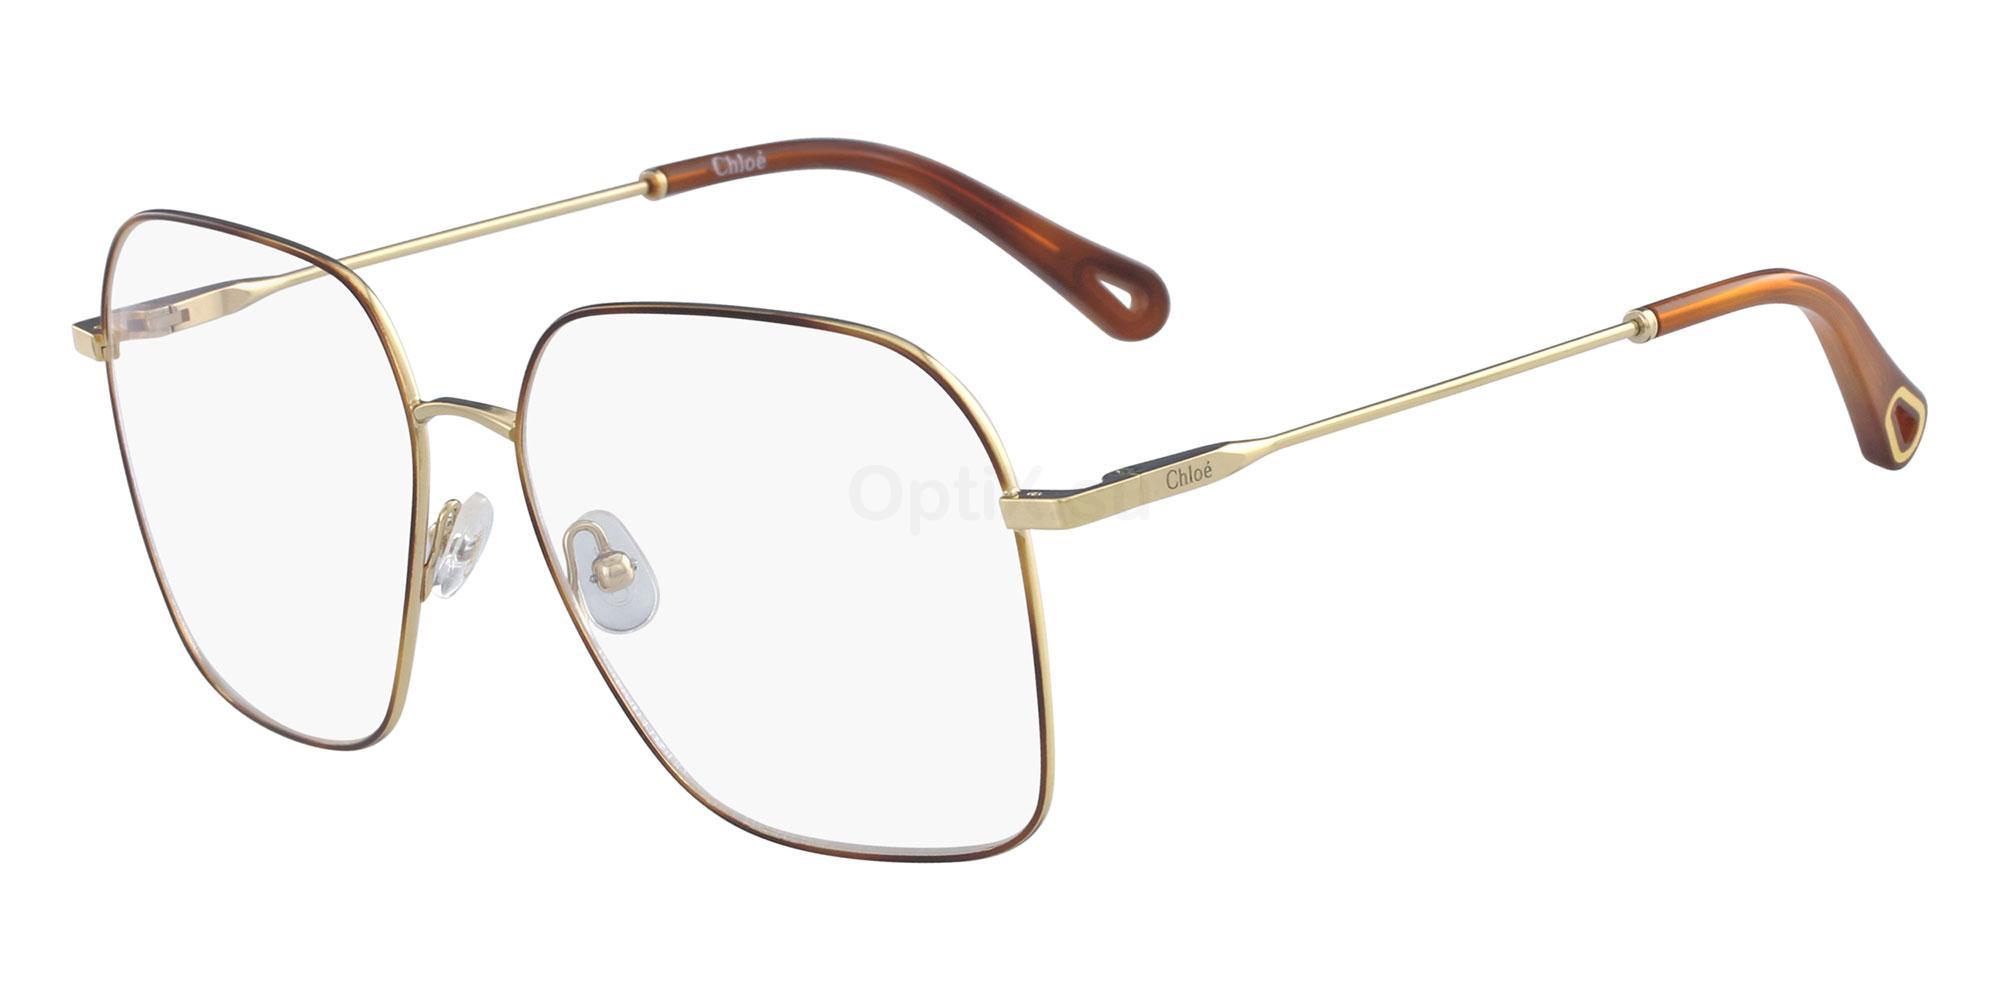 757 CE2135 Glasses, Chloe